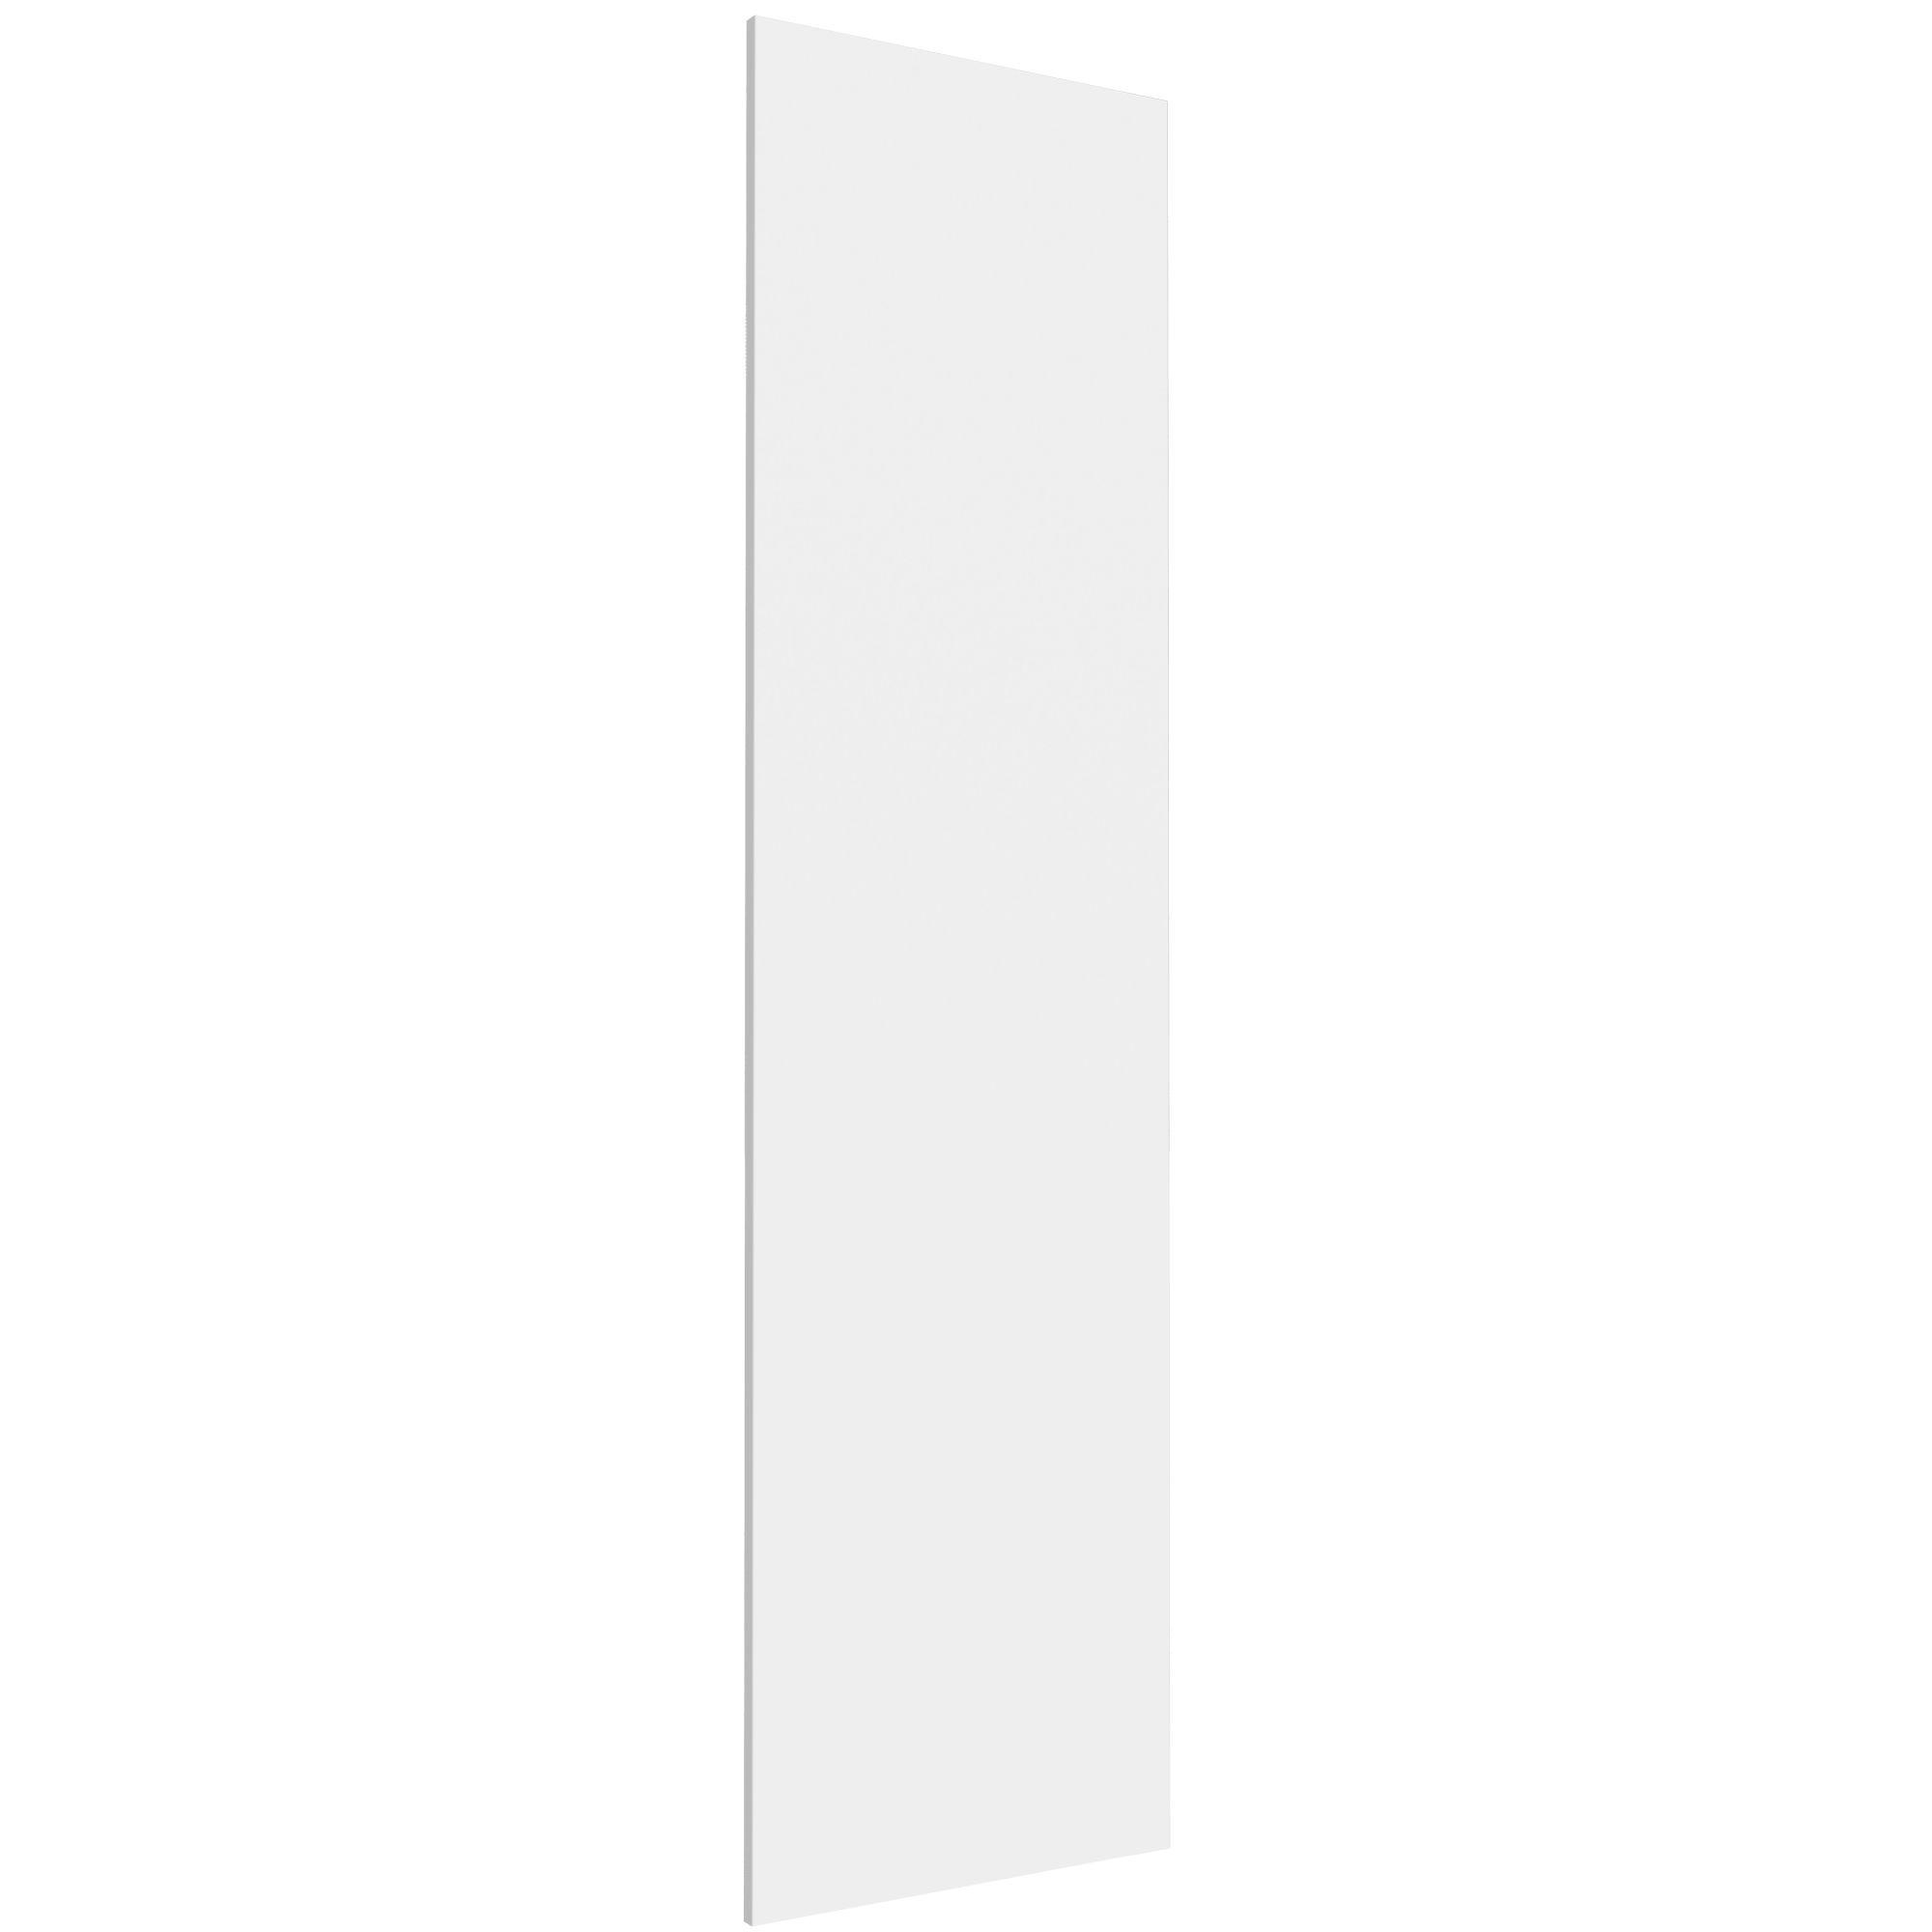 Darwin Modular White & Matt Wardrobe Door (h)1936mm (w)497mm (d)16mm